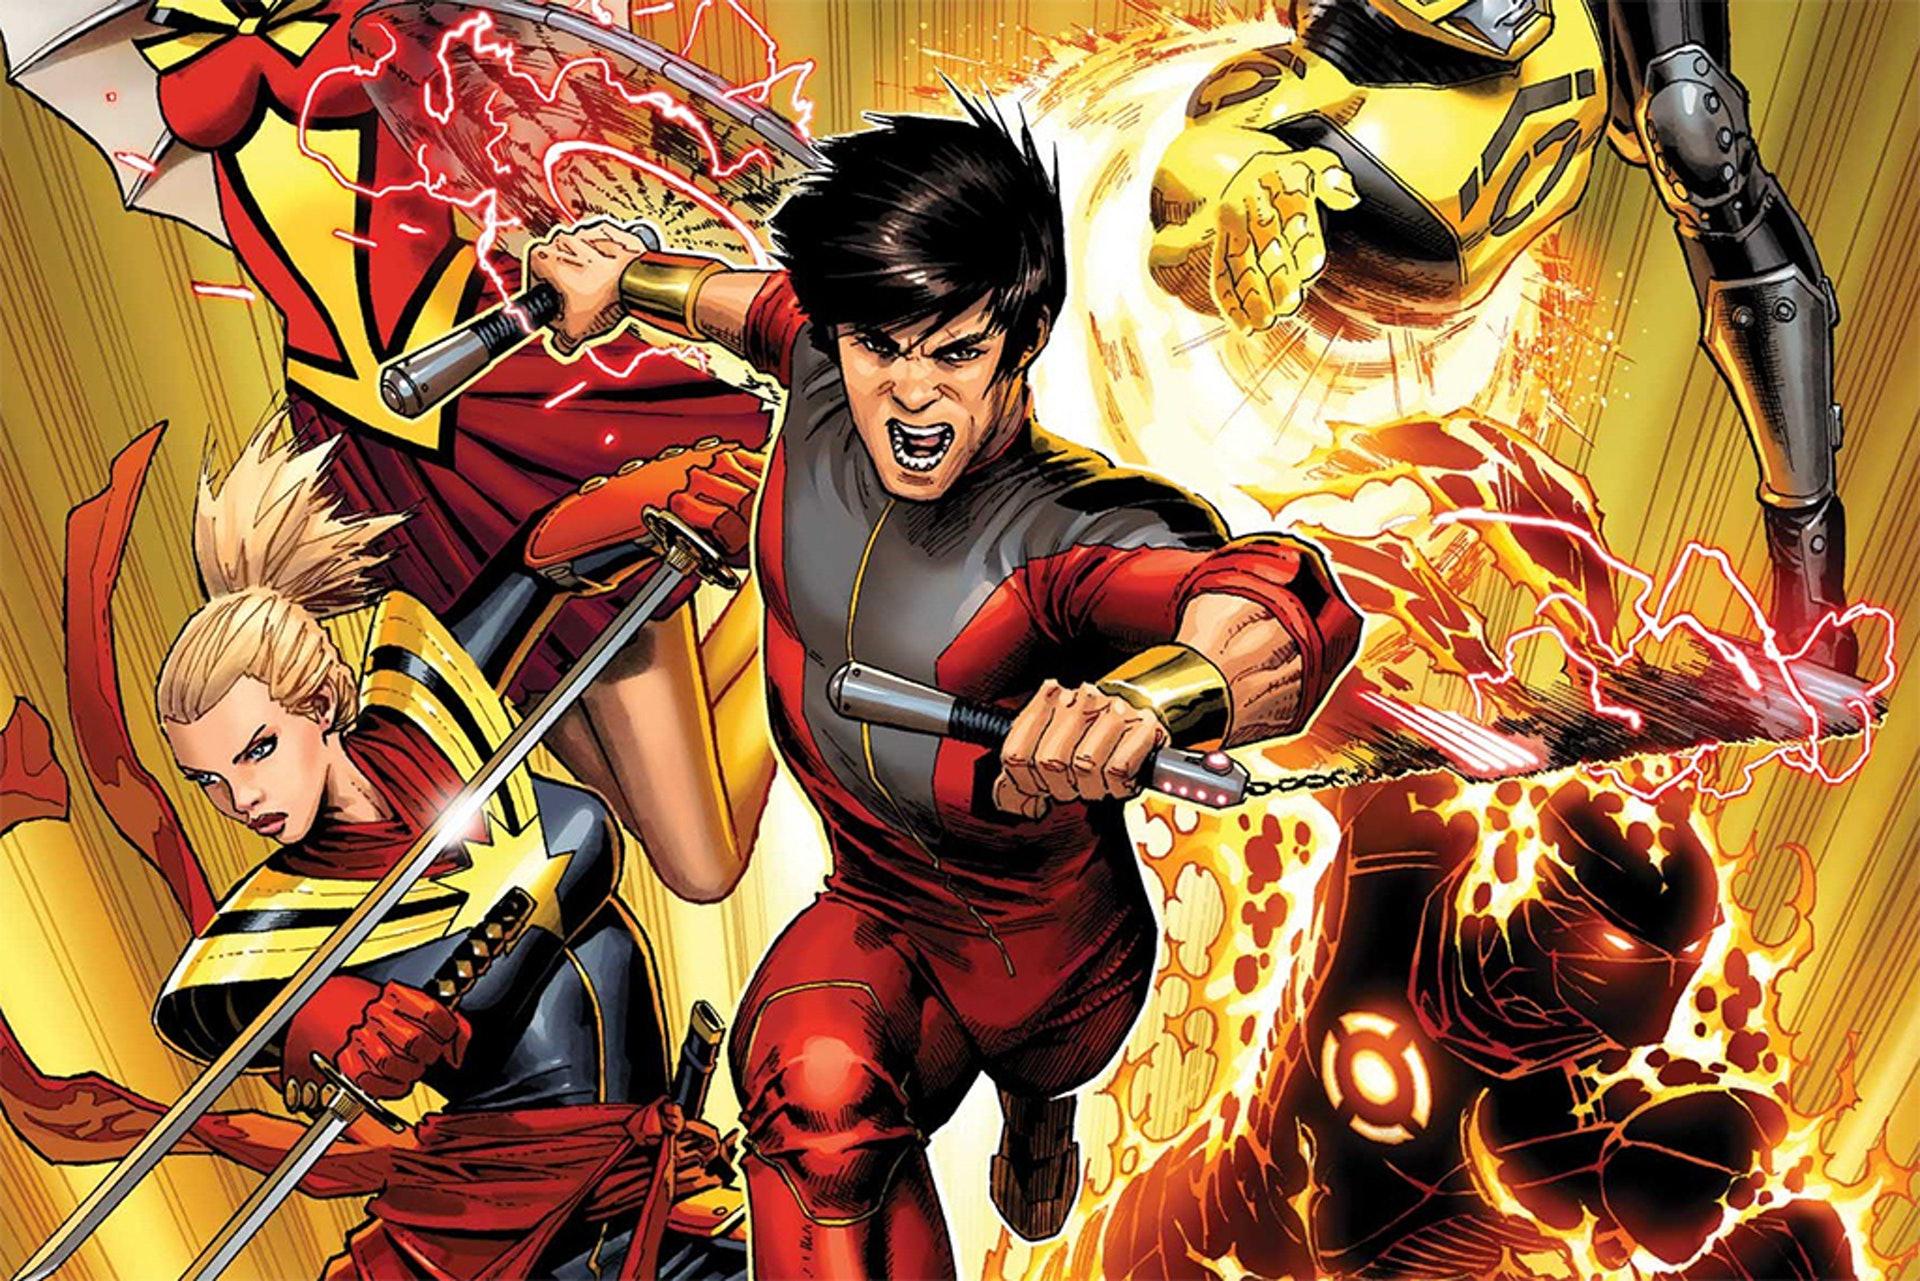 《上氣》將於2021年2月初上映。(Marvel Comics)